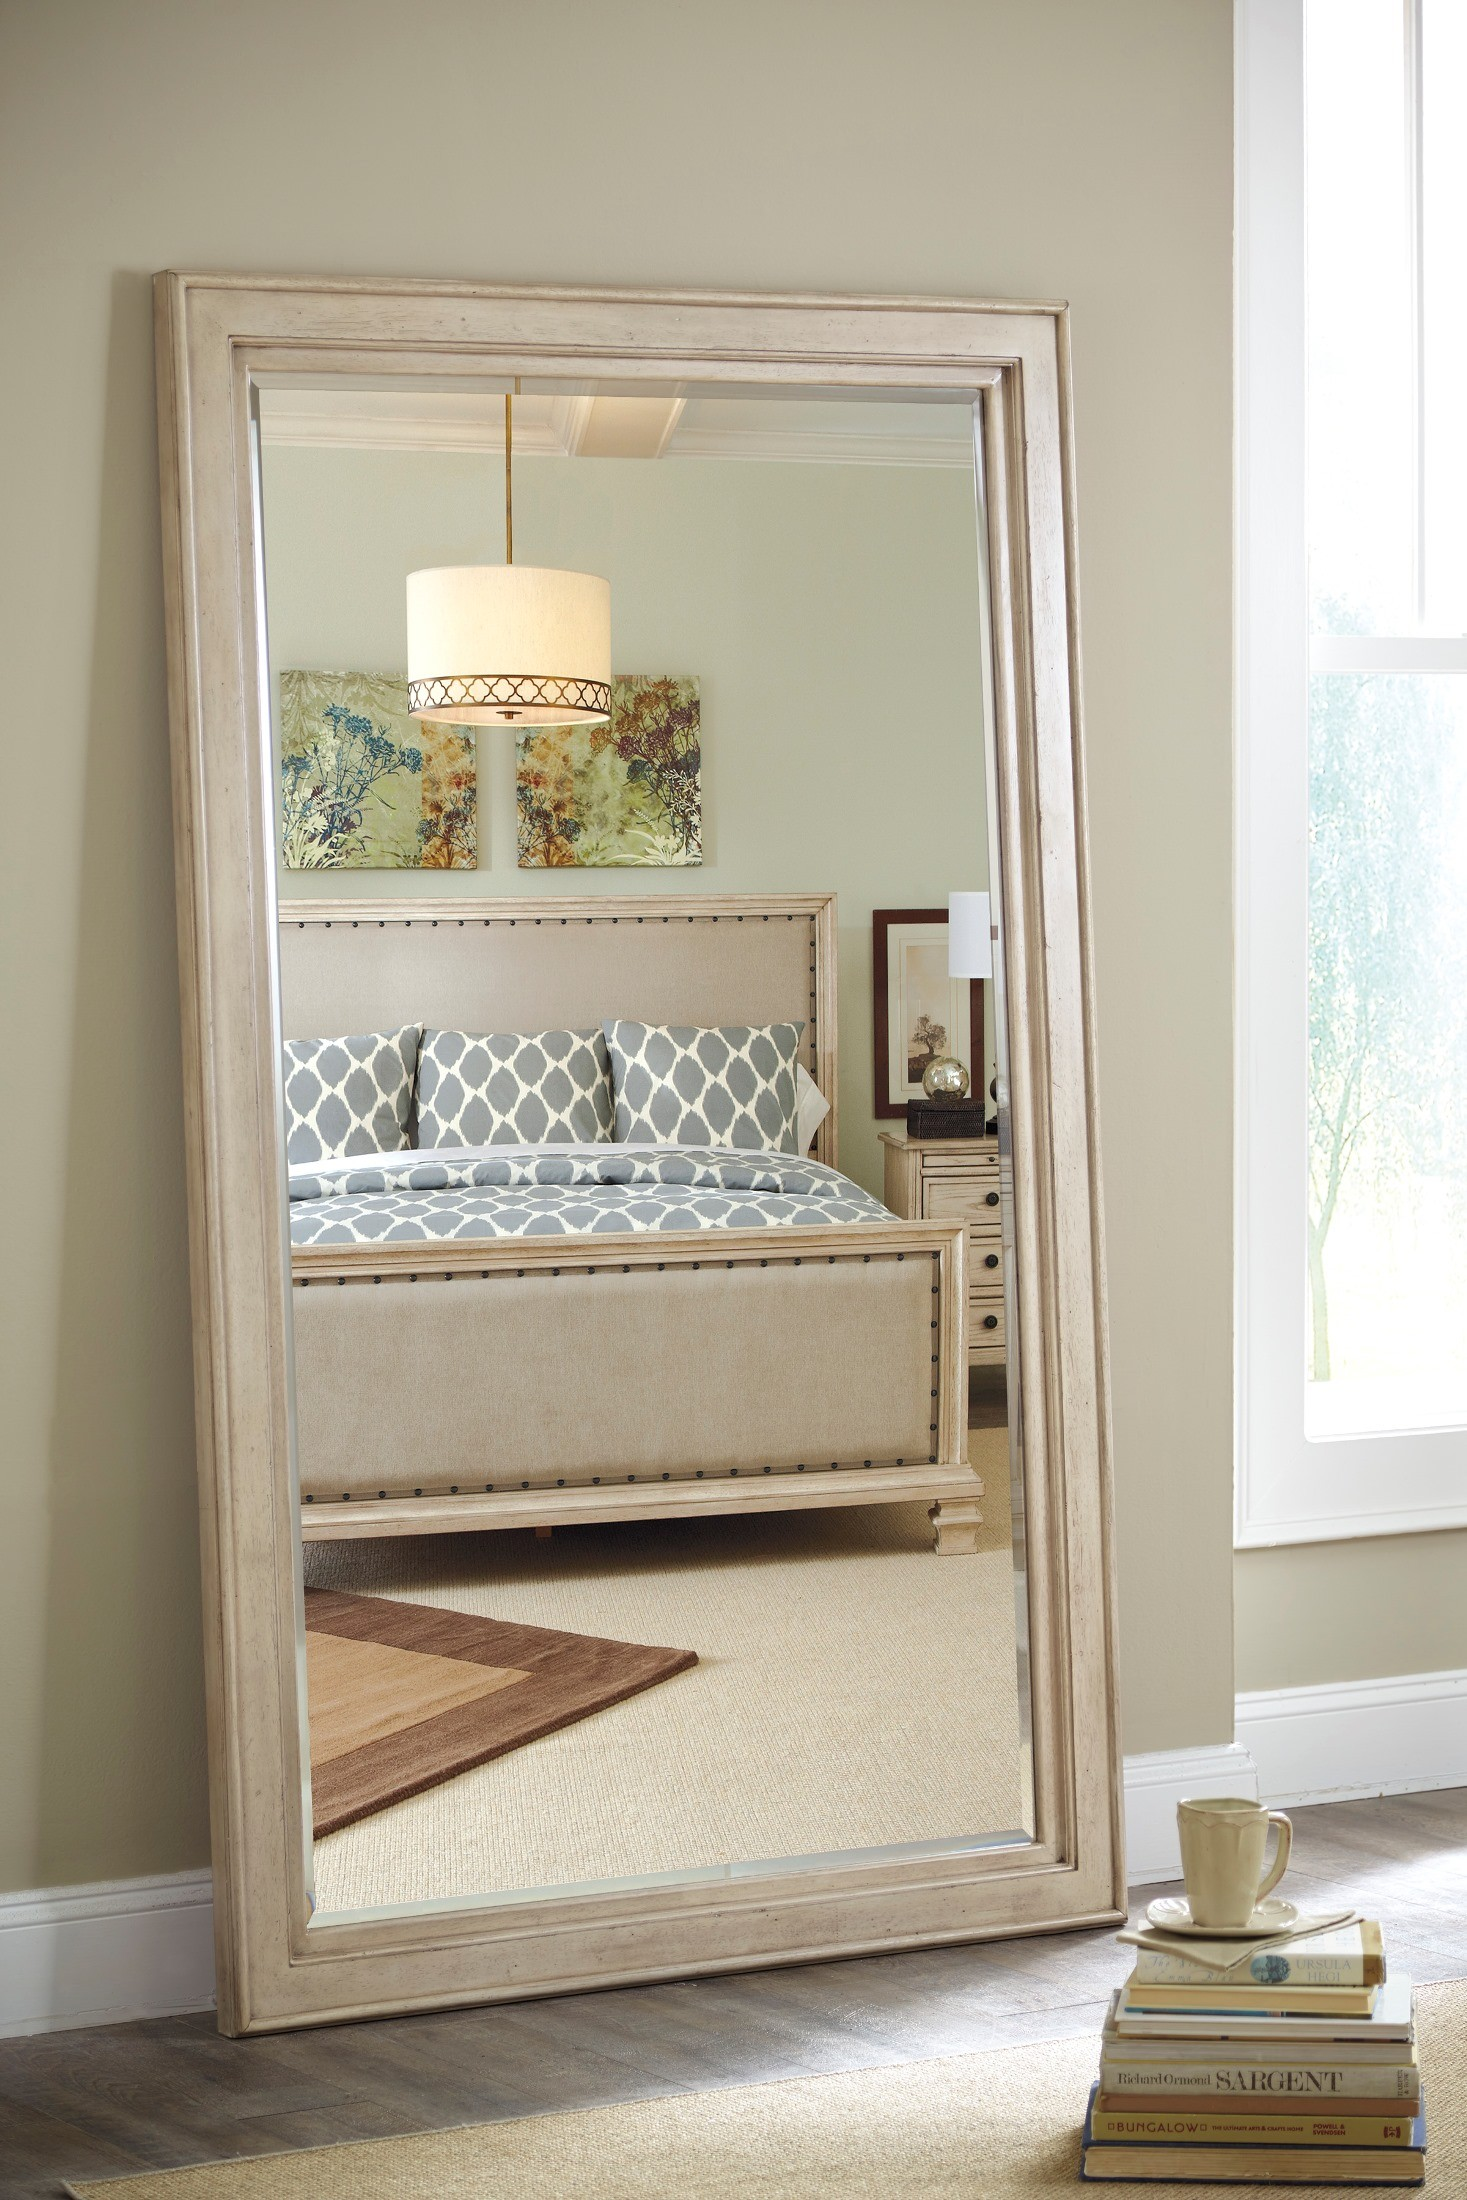 Demarlos Upholstered Panel Bedroom Set B693 77 74 96